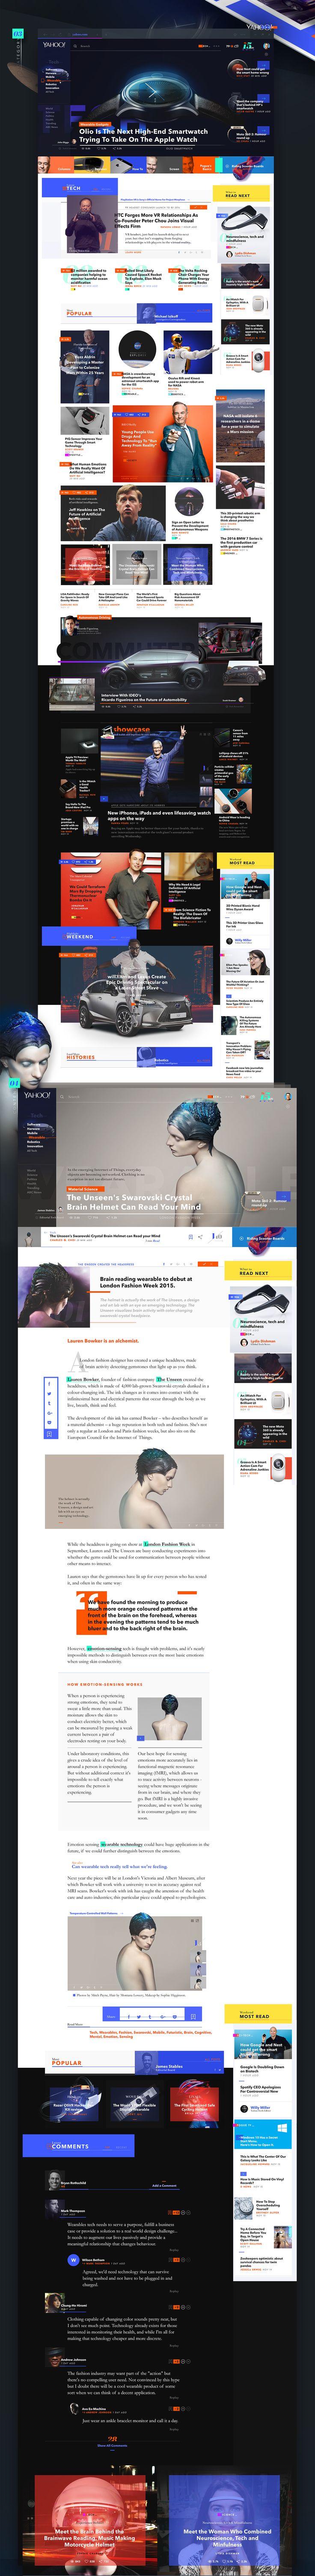 Yahoo! News Redesign Experience / Josué Solano